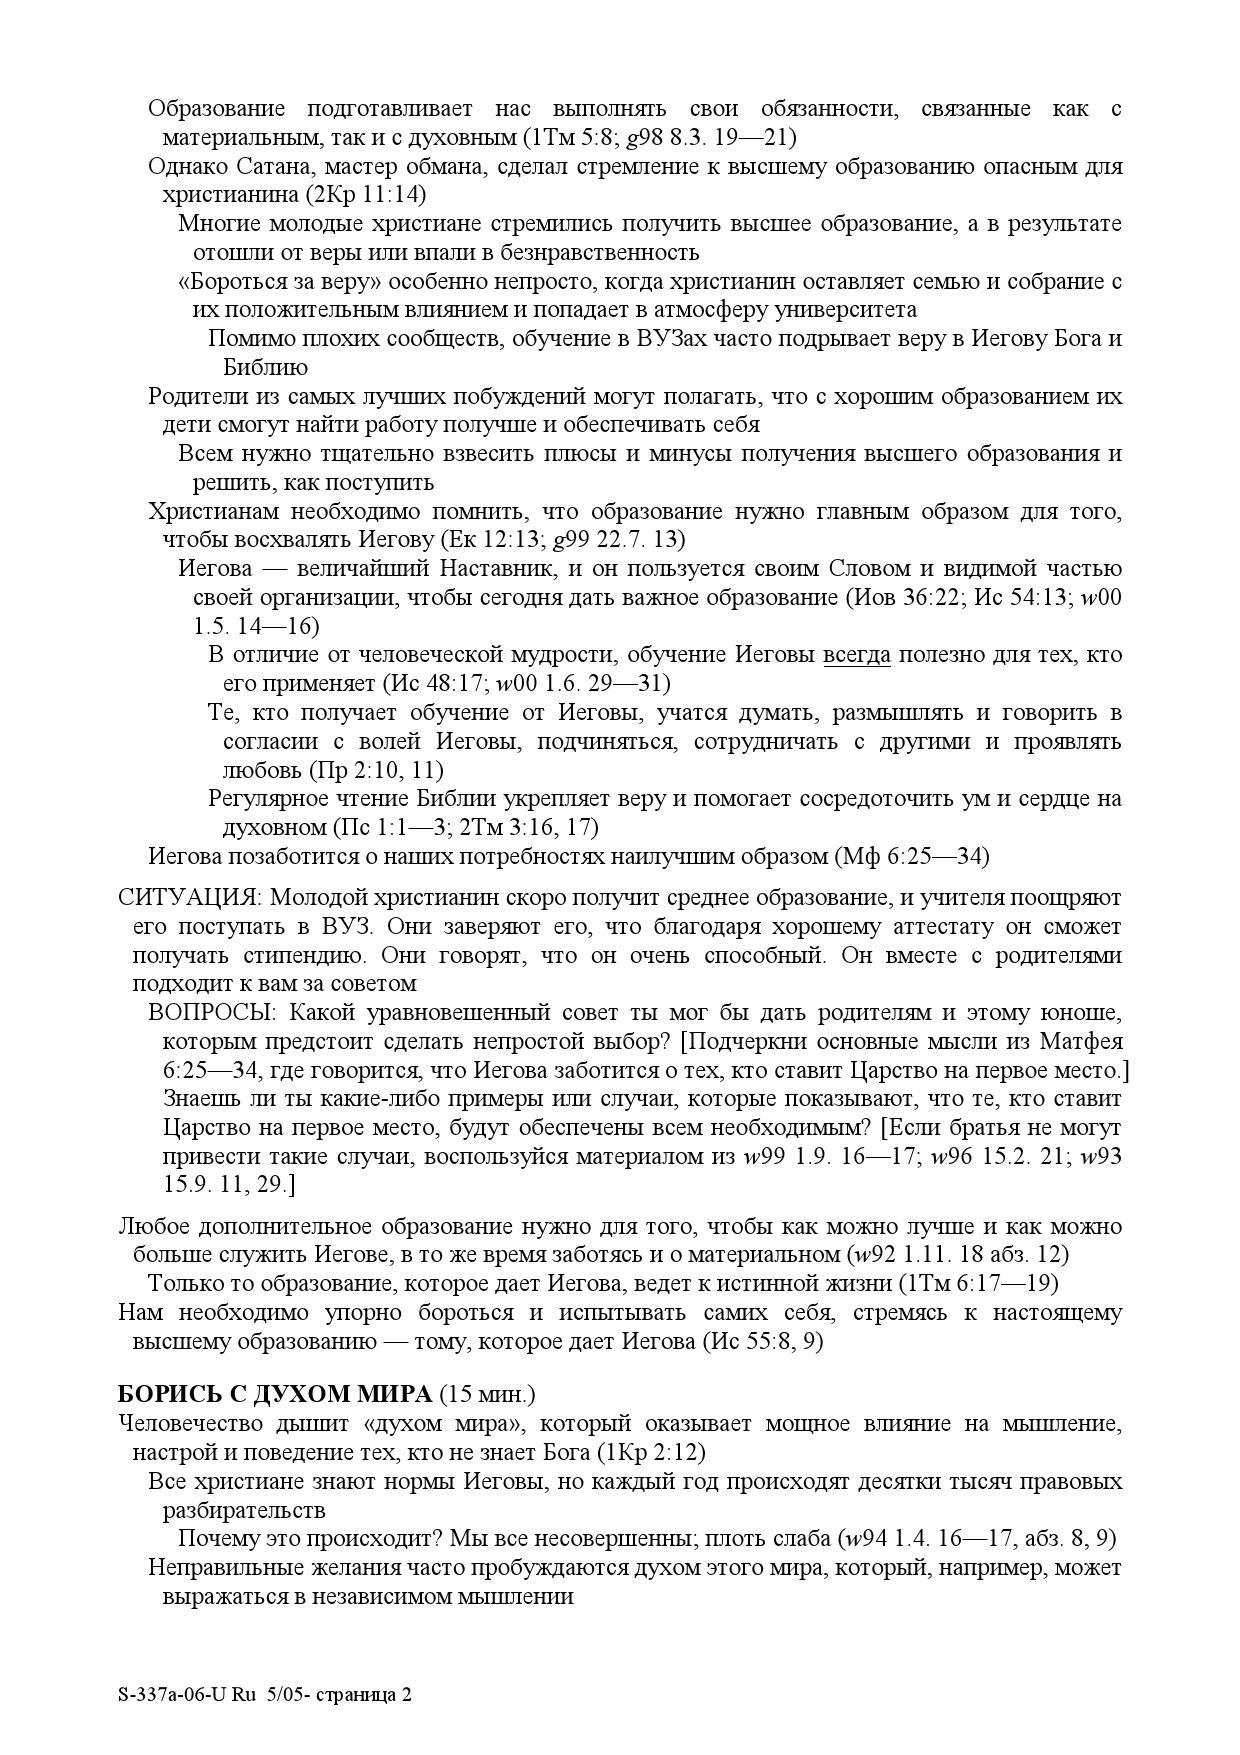 S-337-U-5-05 (конец, ВО, независ.мышл)_000002